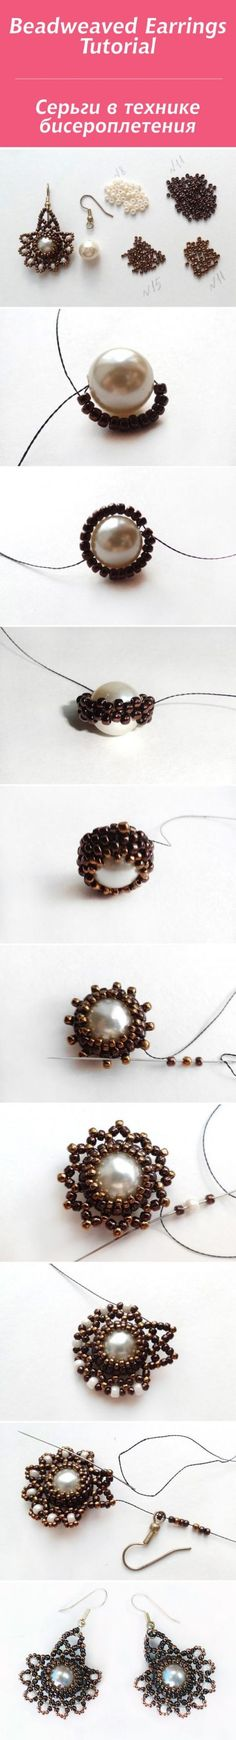 (1) Создаем серьги в технике бисероплетения / Beadweaved Earrings Tutorial | jewellery video